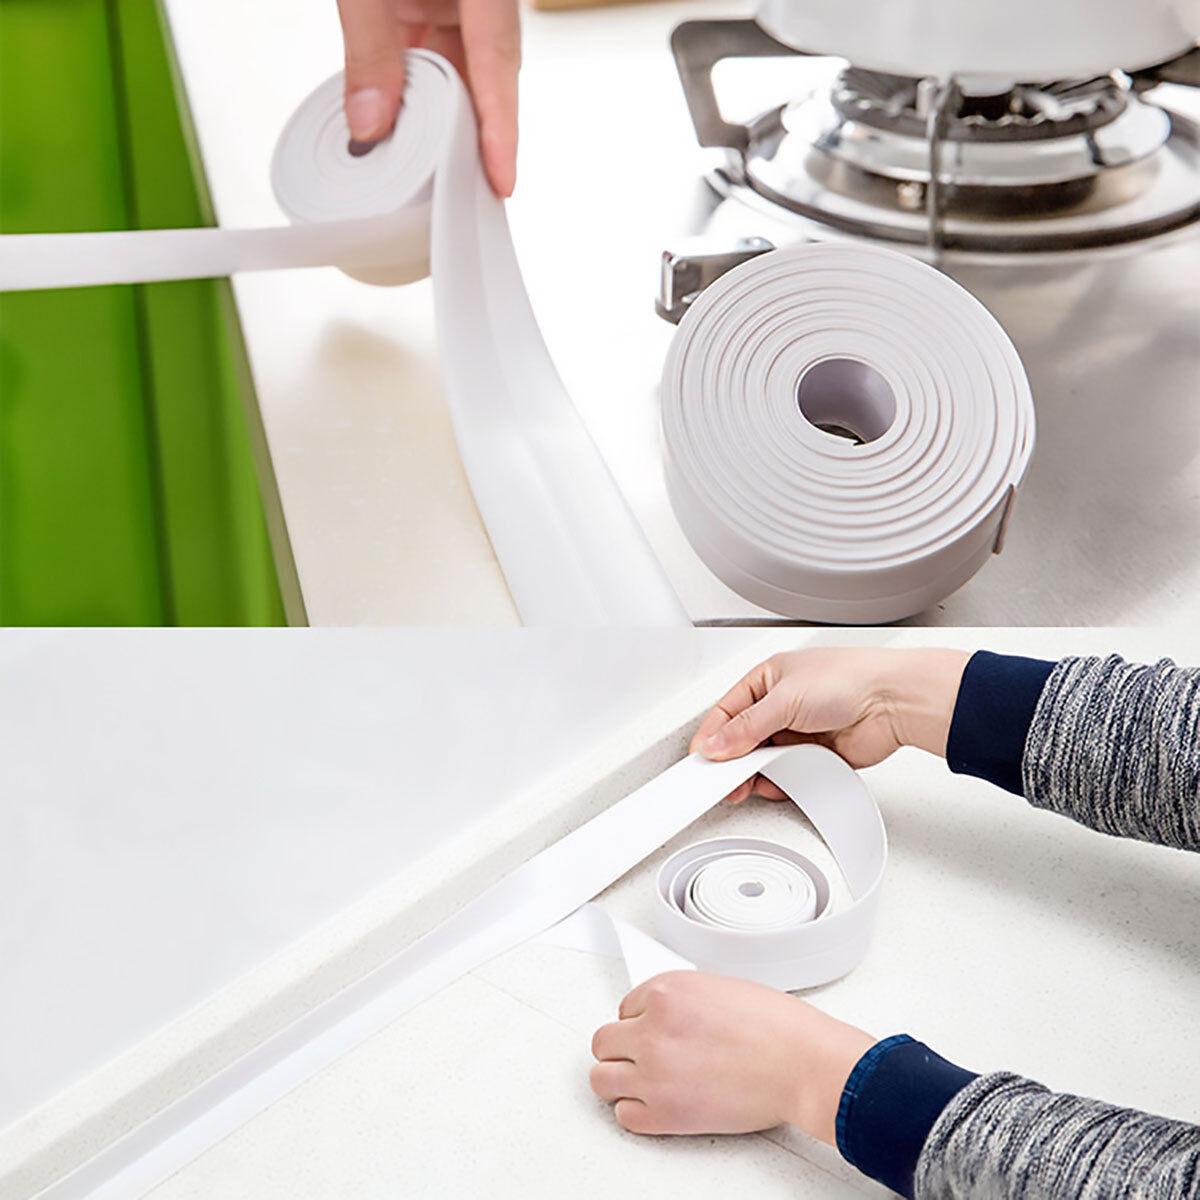 Home, Furniture & DIY 2X3.2M*38mm Wall Sealing Strip Bath Shower Sink Basin Edge Kitchen Sealant Tape